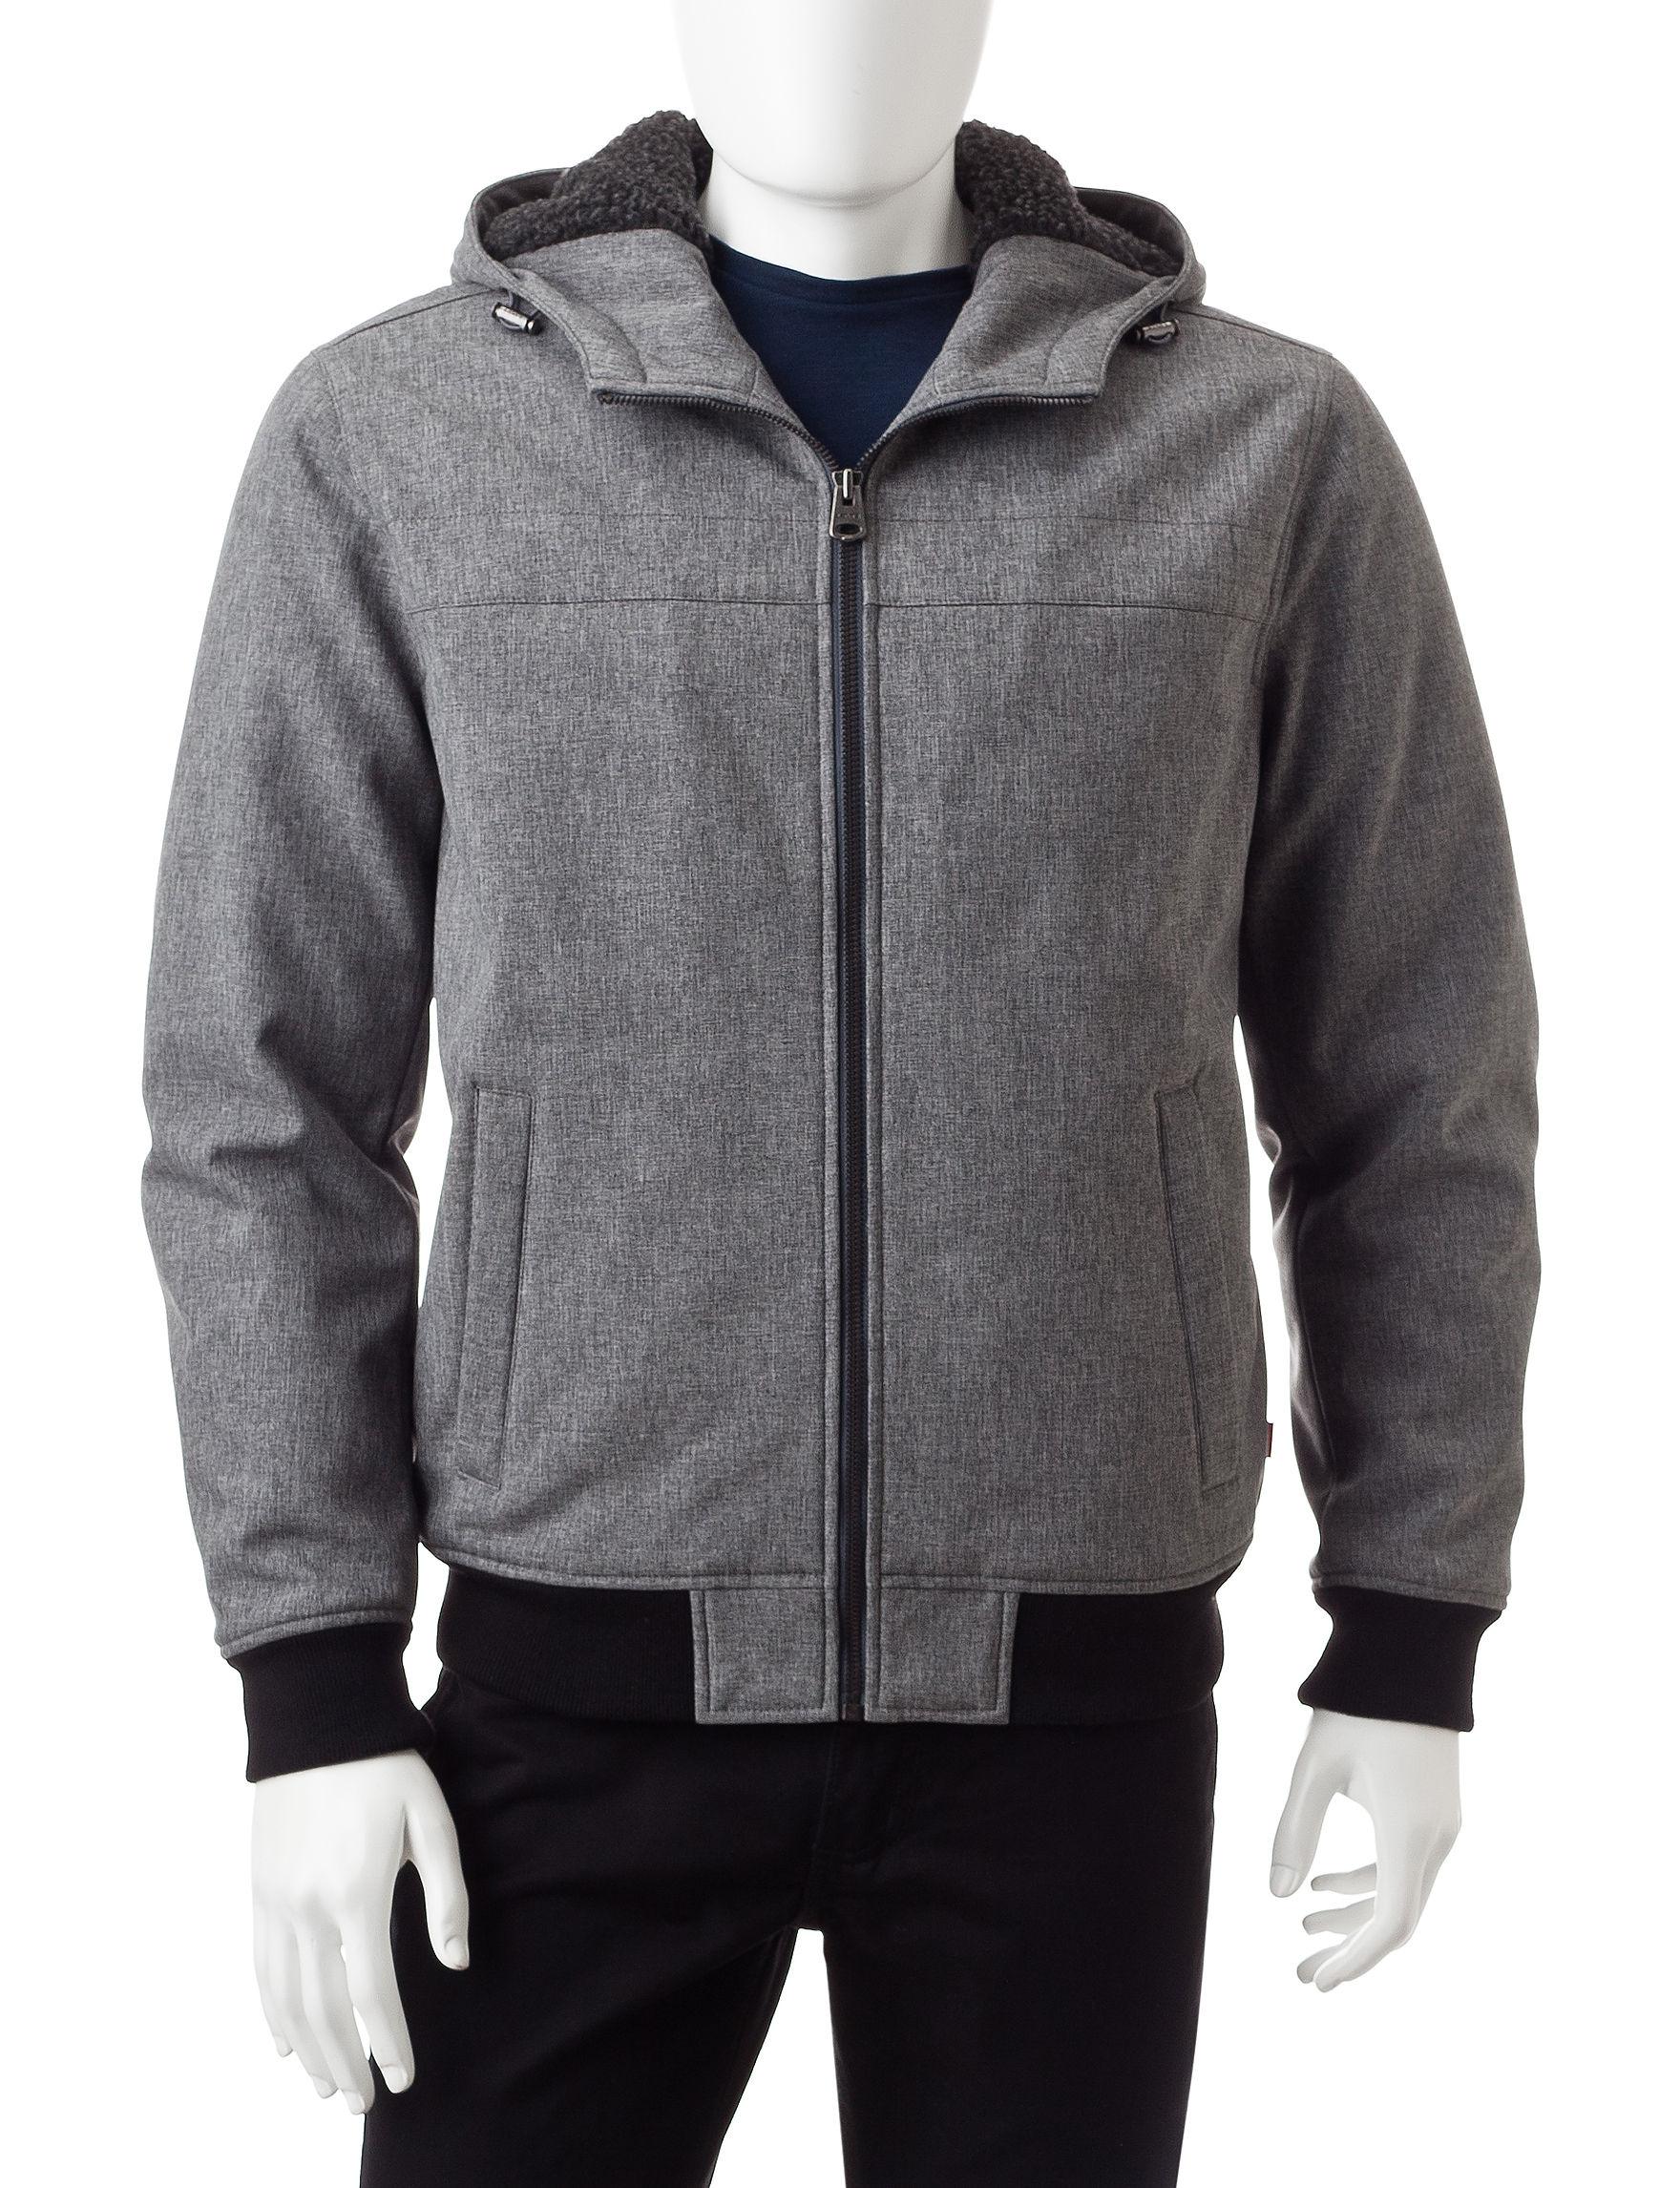 Levi's Heather Grey Lightweight Jackets & Blazers